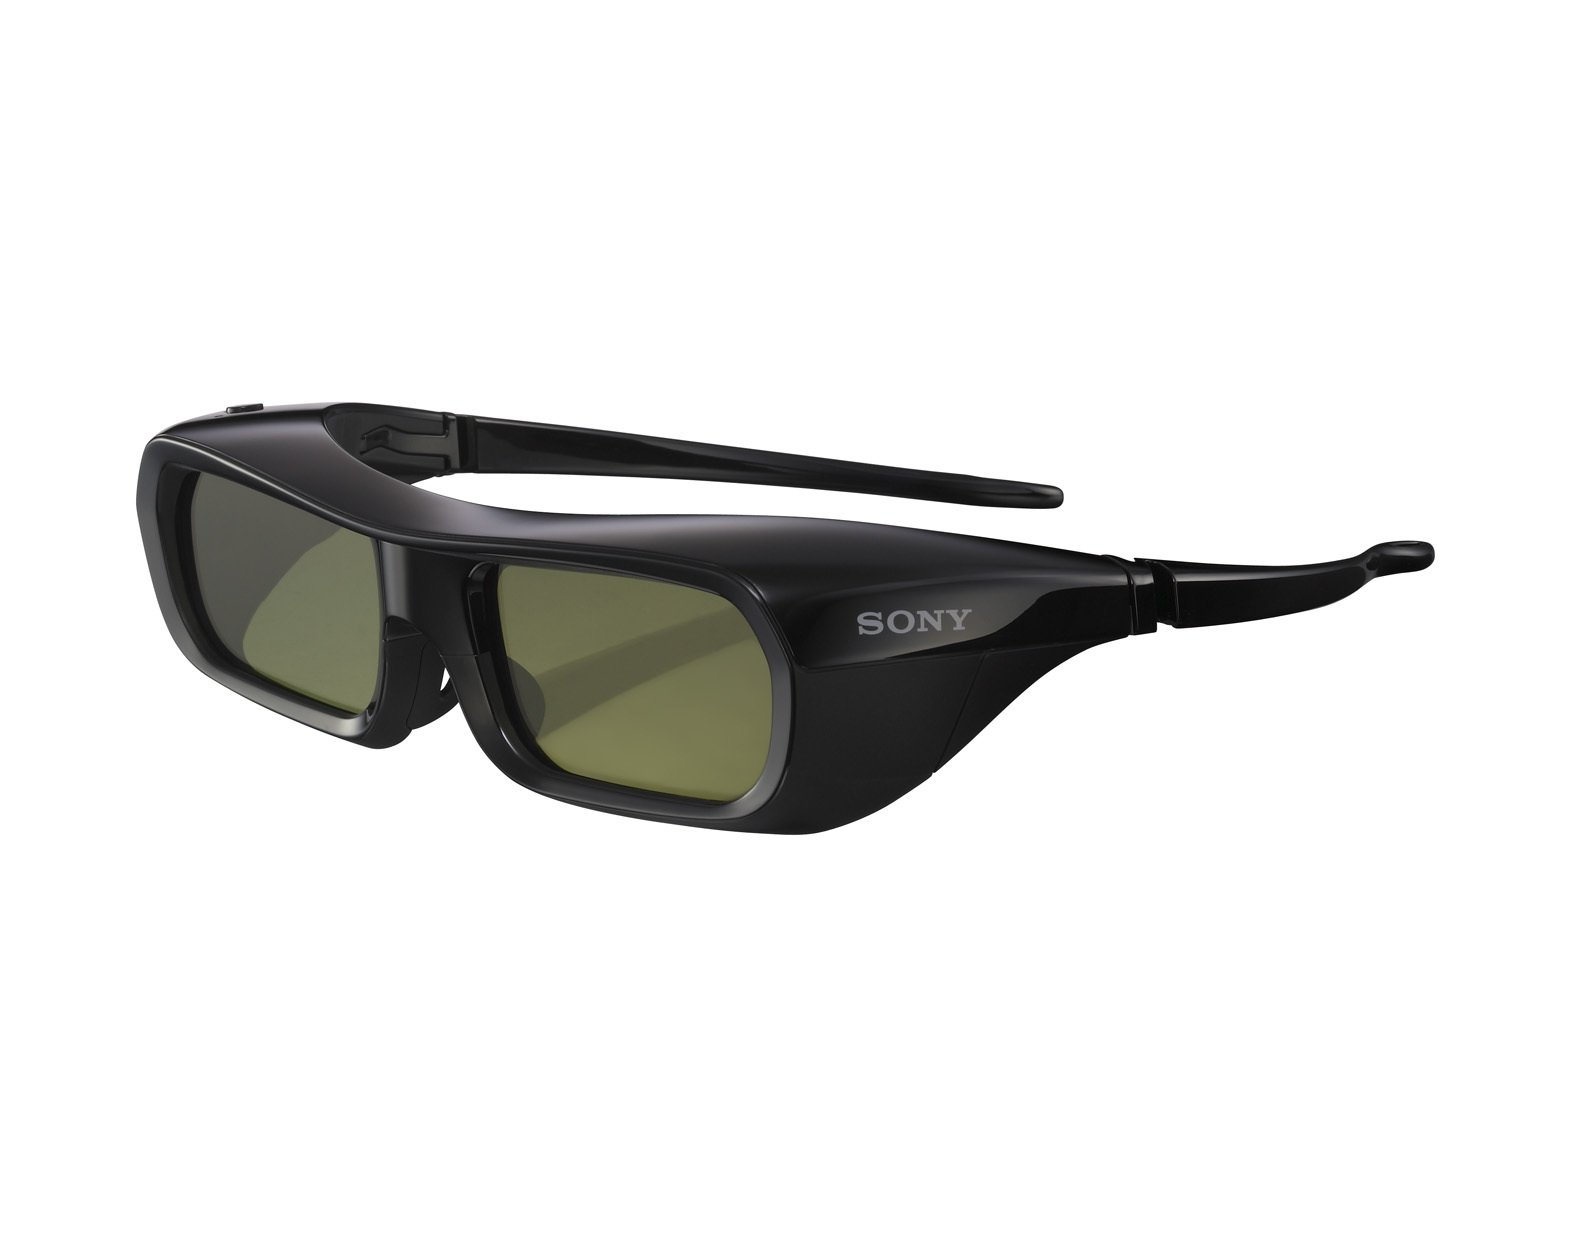 Sony TDGPJ1 3D Glasses